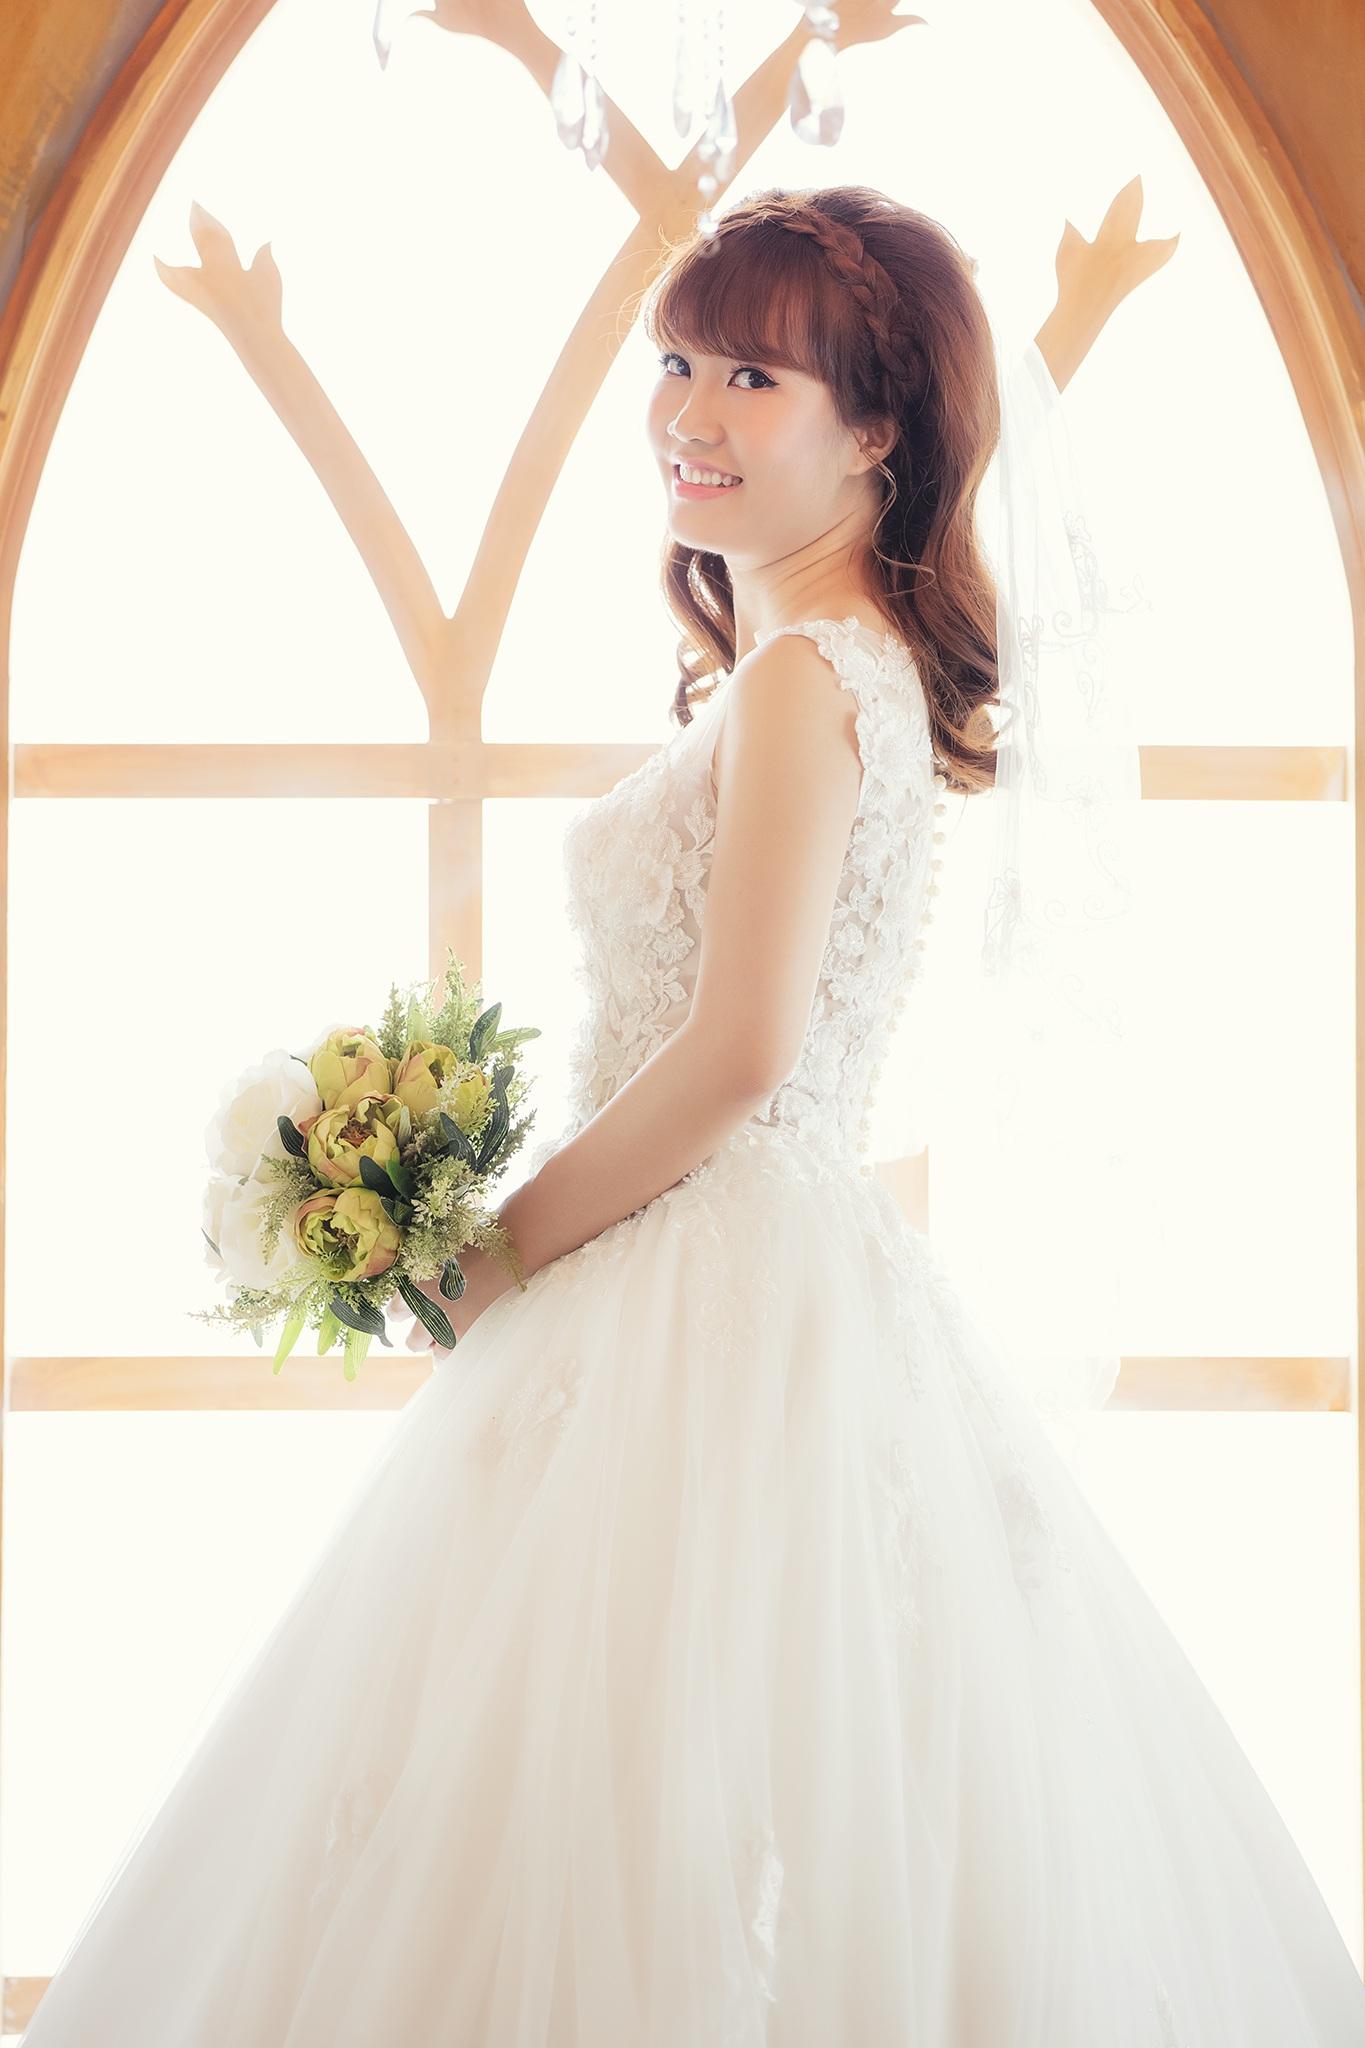 8c19ba5b8ec9 kvinde hvid tøj bryllup bryllupskjole brud kjole smuk kjole brudepige  quinceanera brude tøj